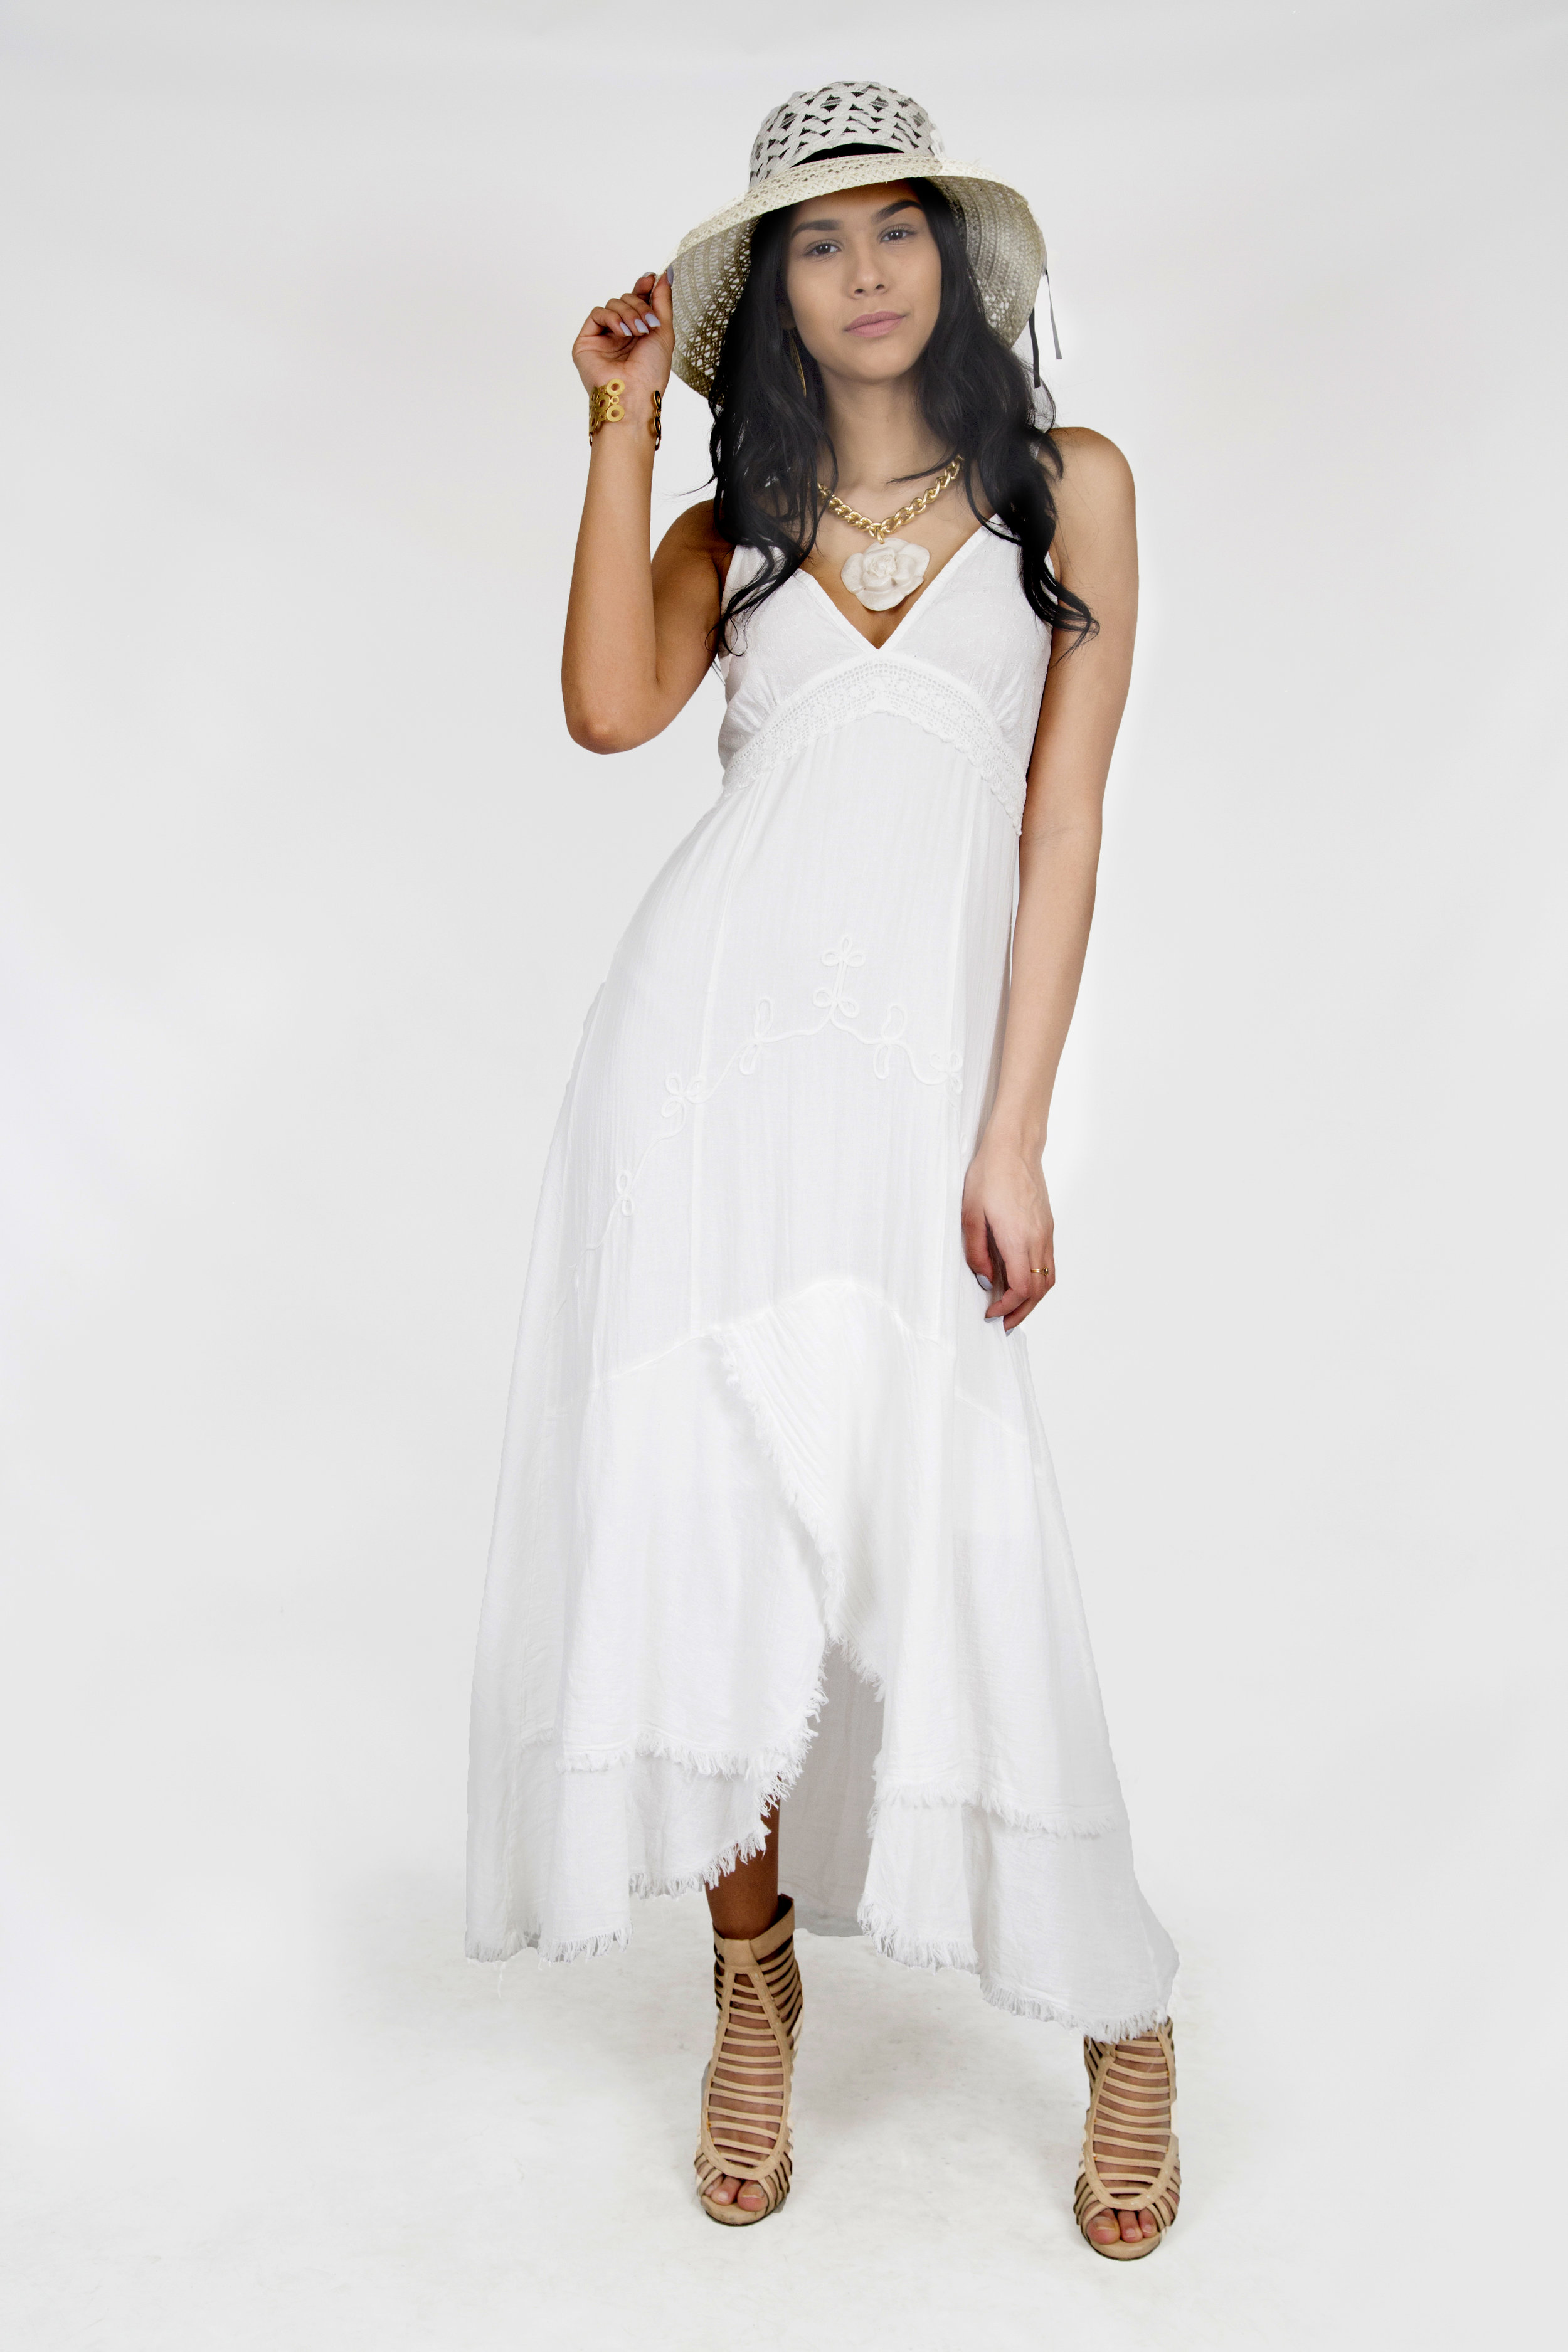 Summer Cotton Dress - https://www.ebay.com/itm/223503299456